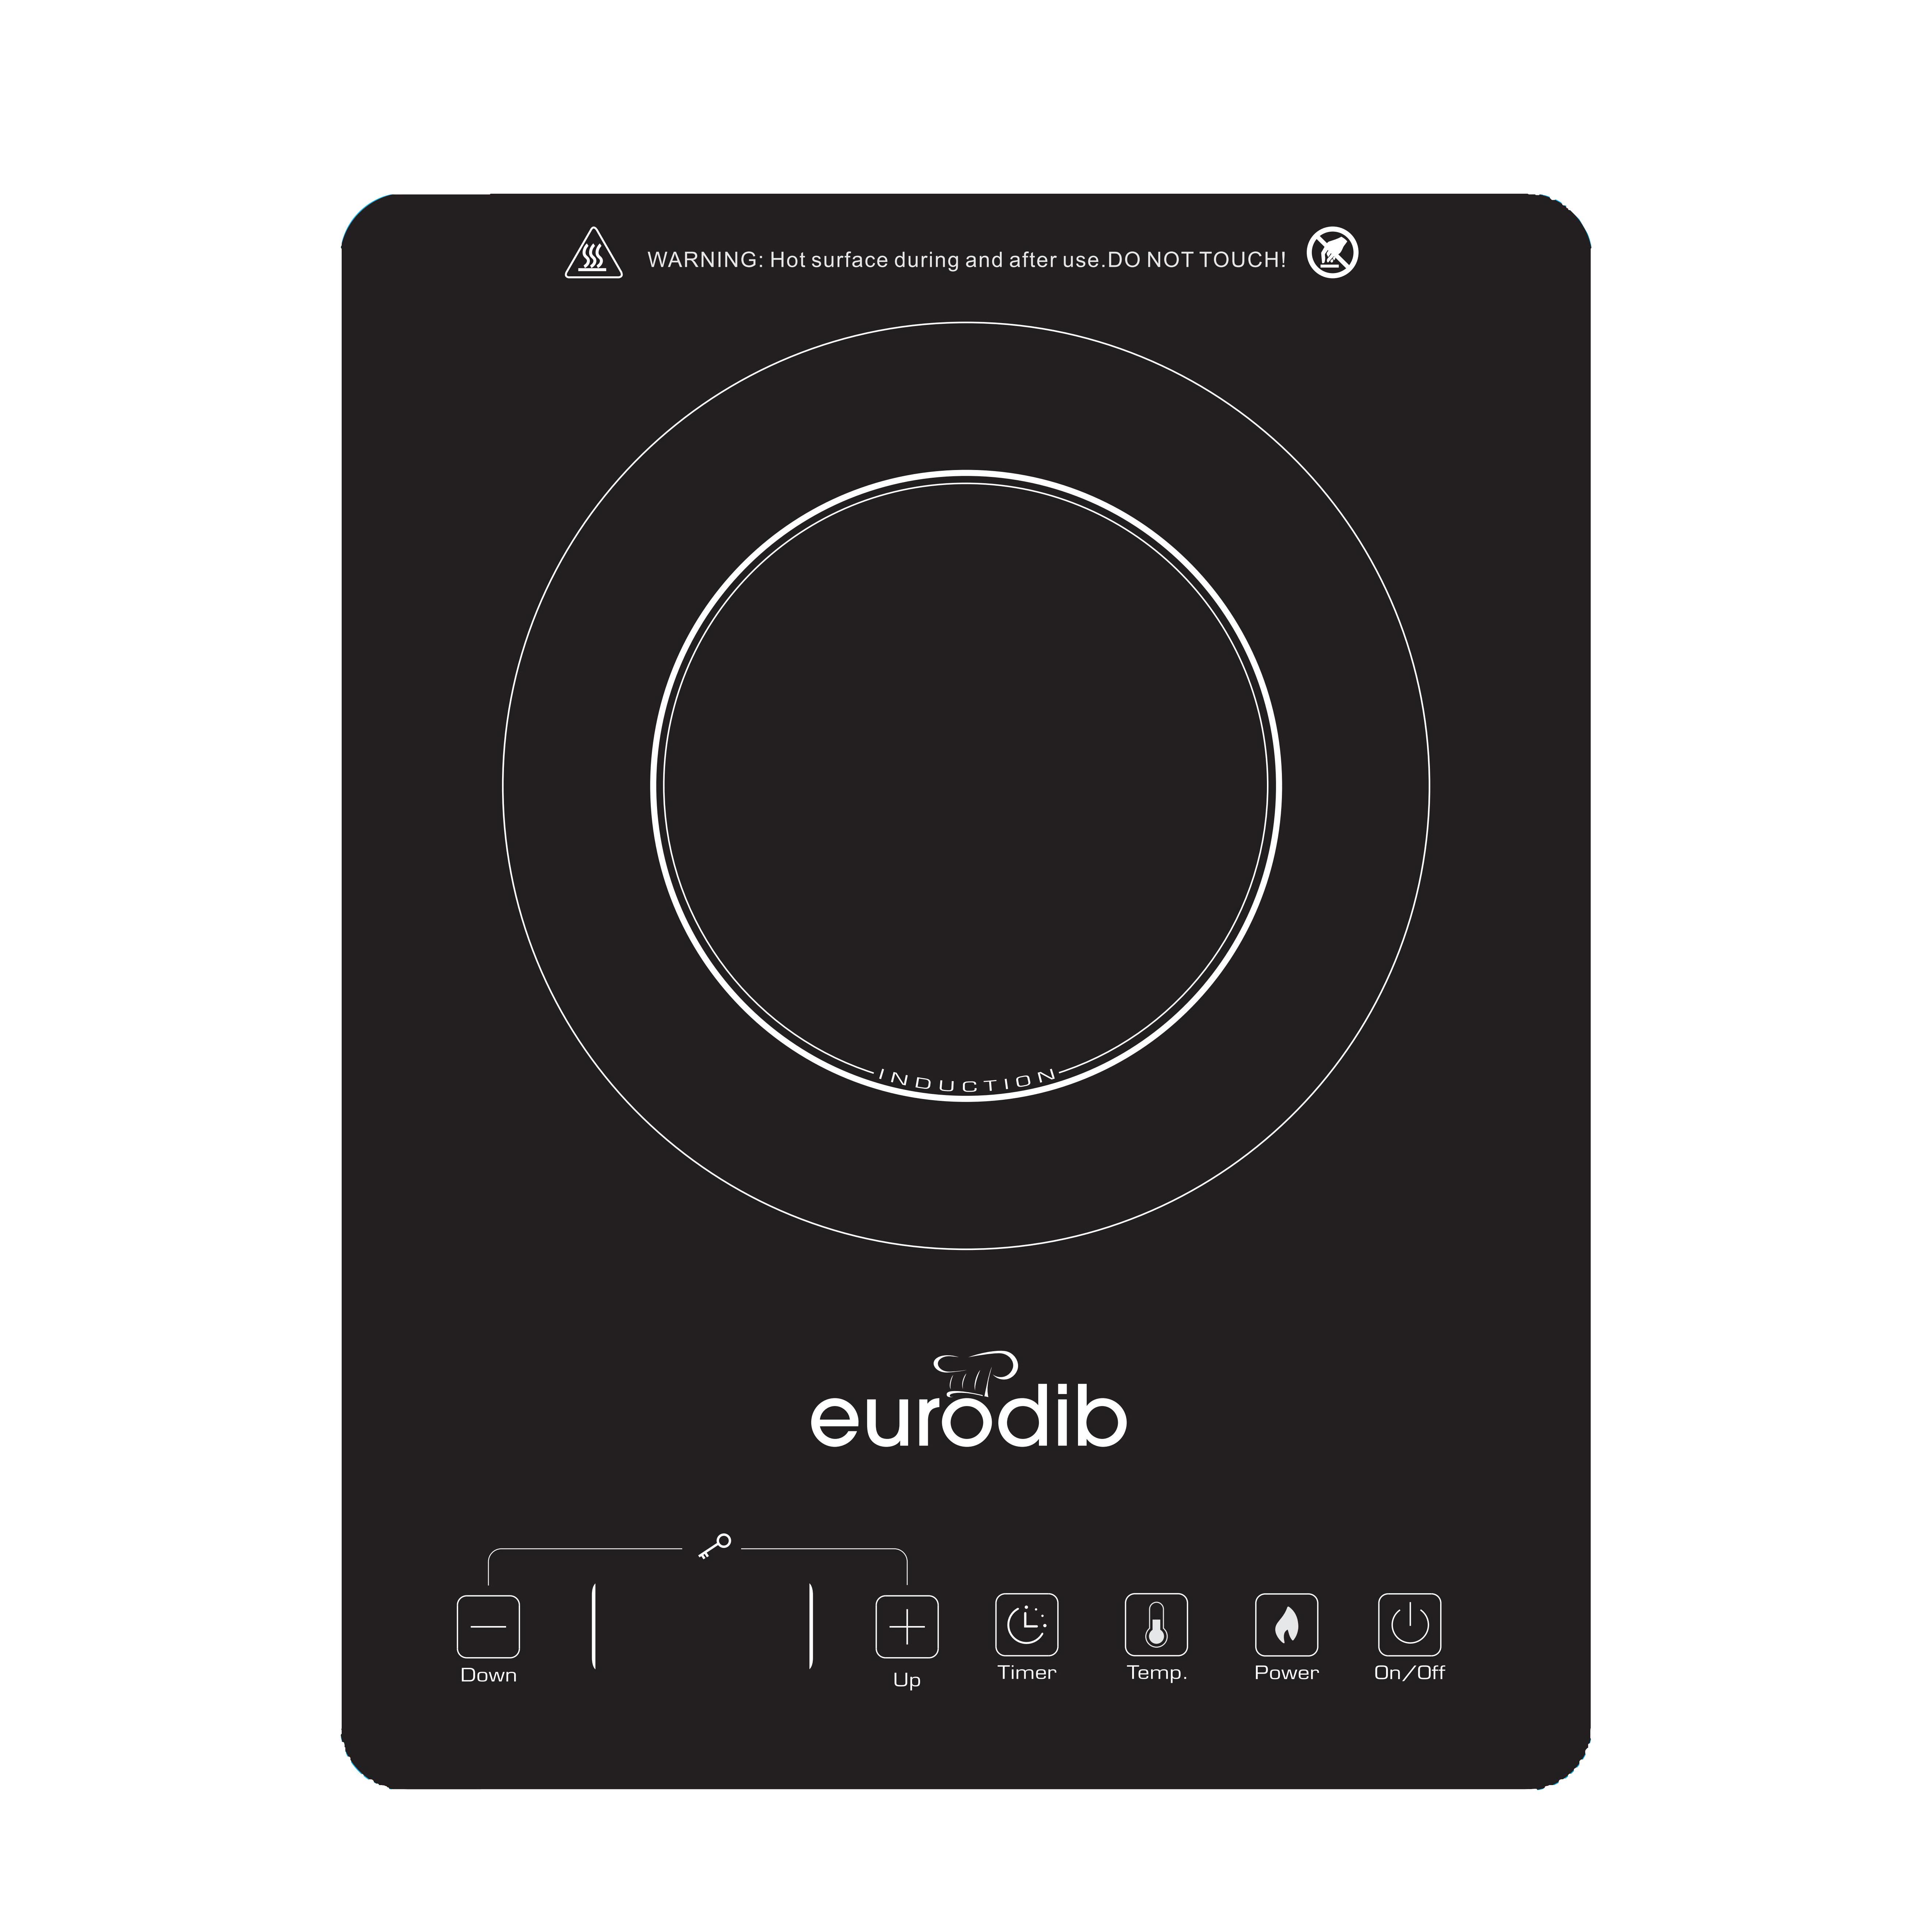 Eurodib USA EG13 induction range, countertop